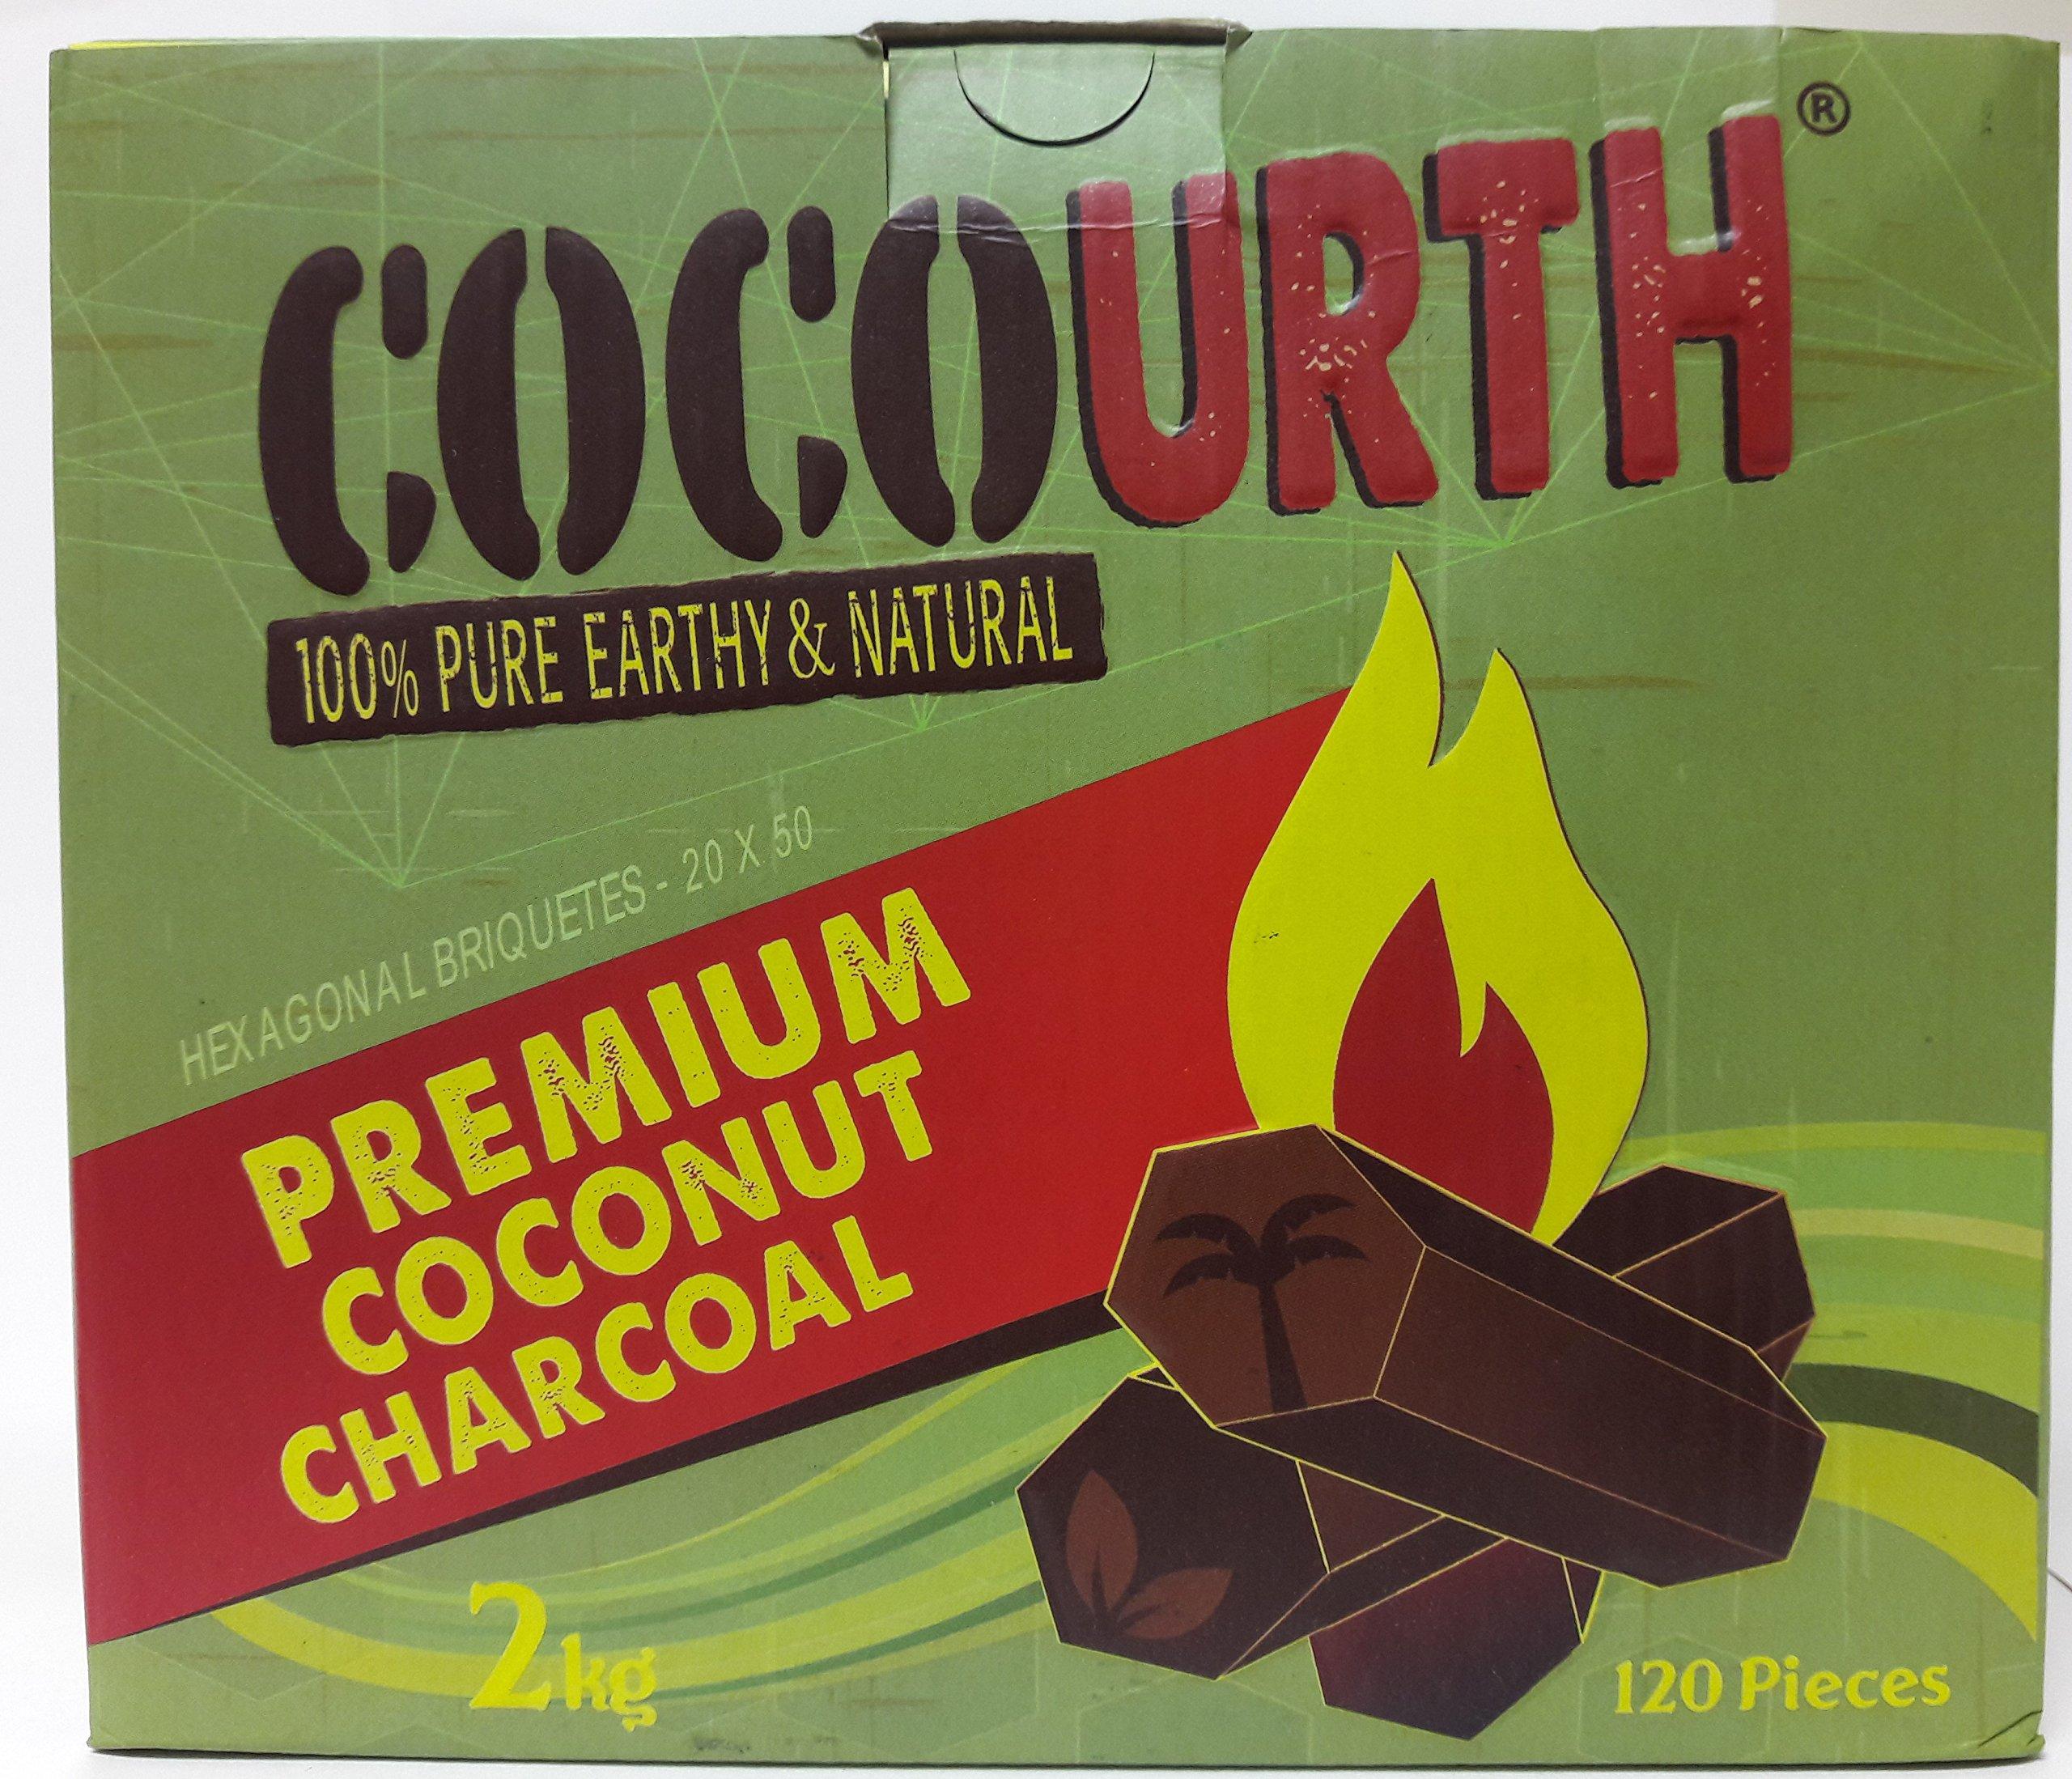 Hookah Natural Coconut Charcoal 120 Pieces HEXAGONS Coco Urth 2 Kilo Shisha Coal